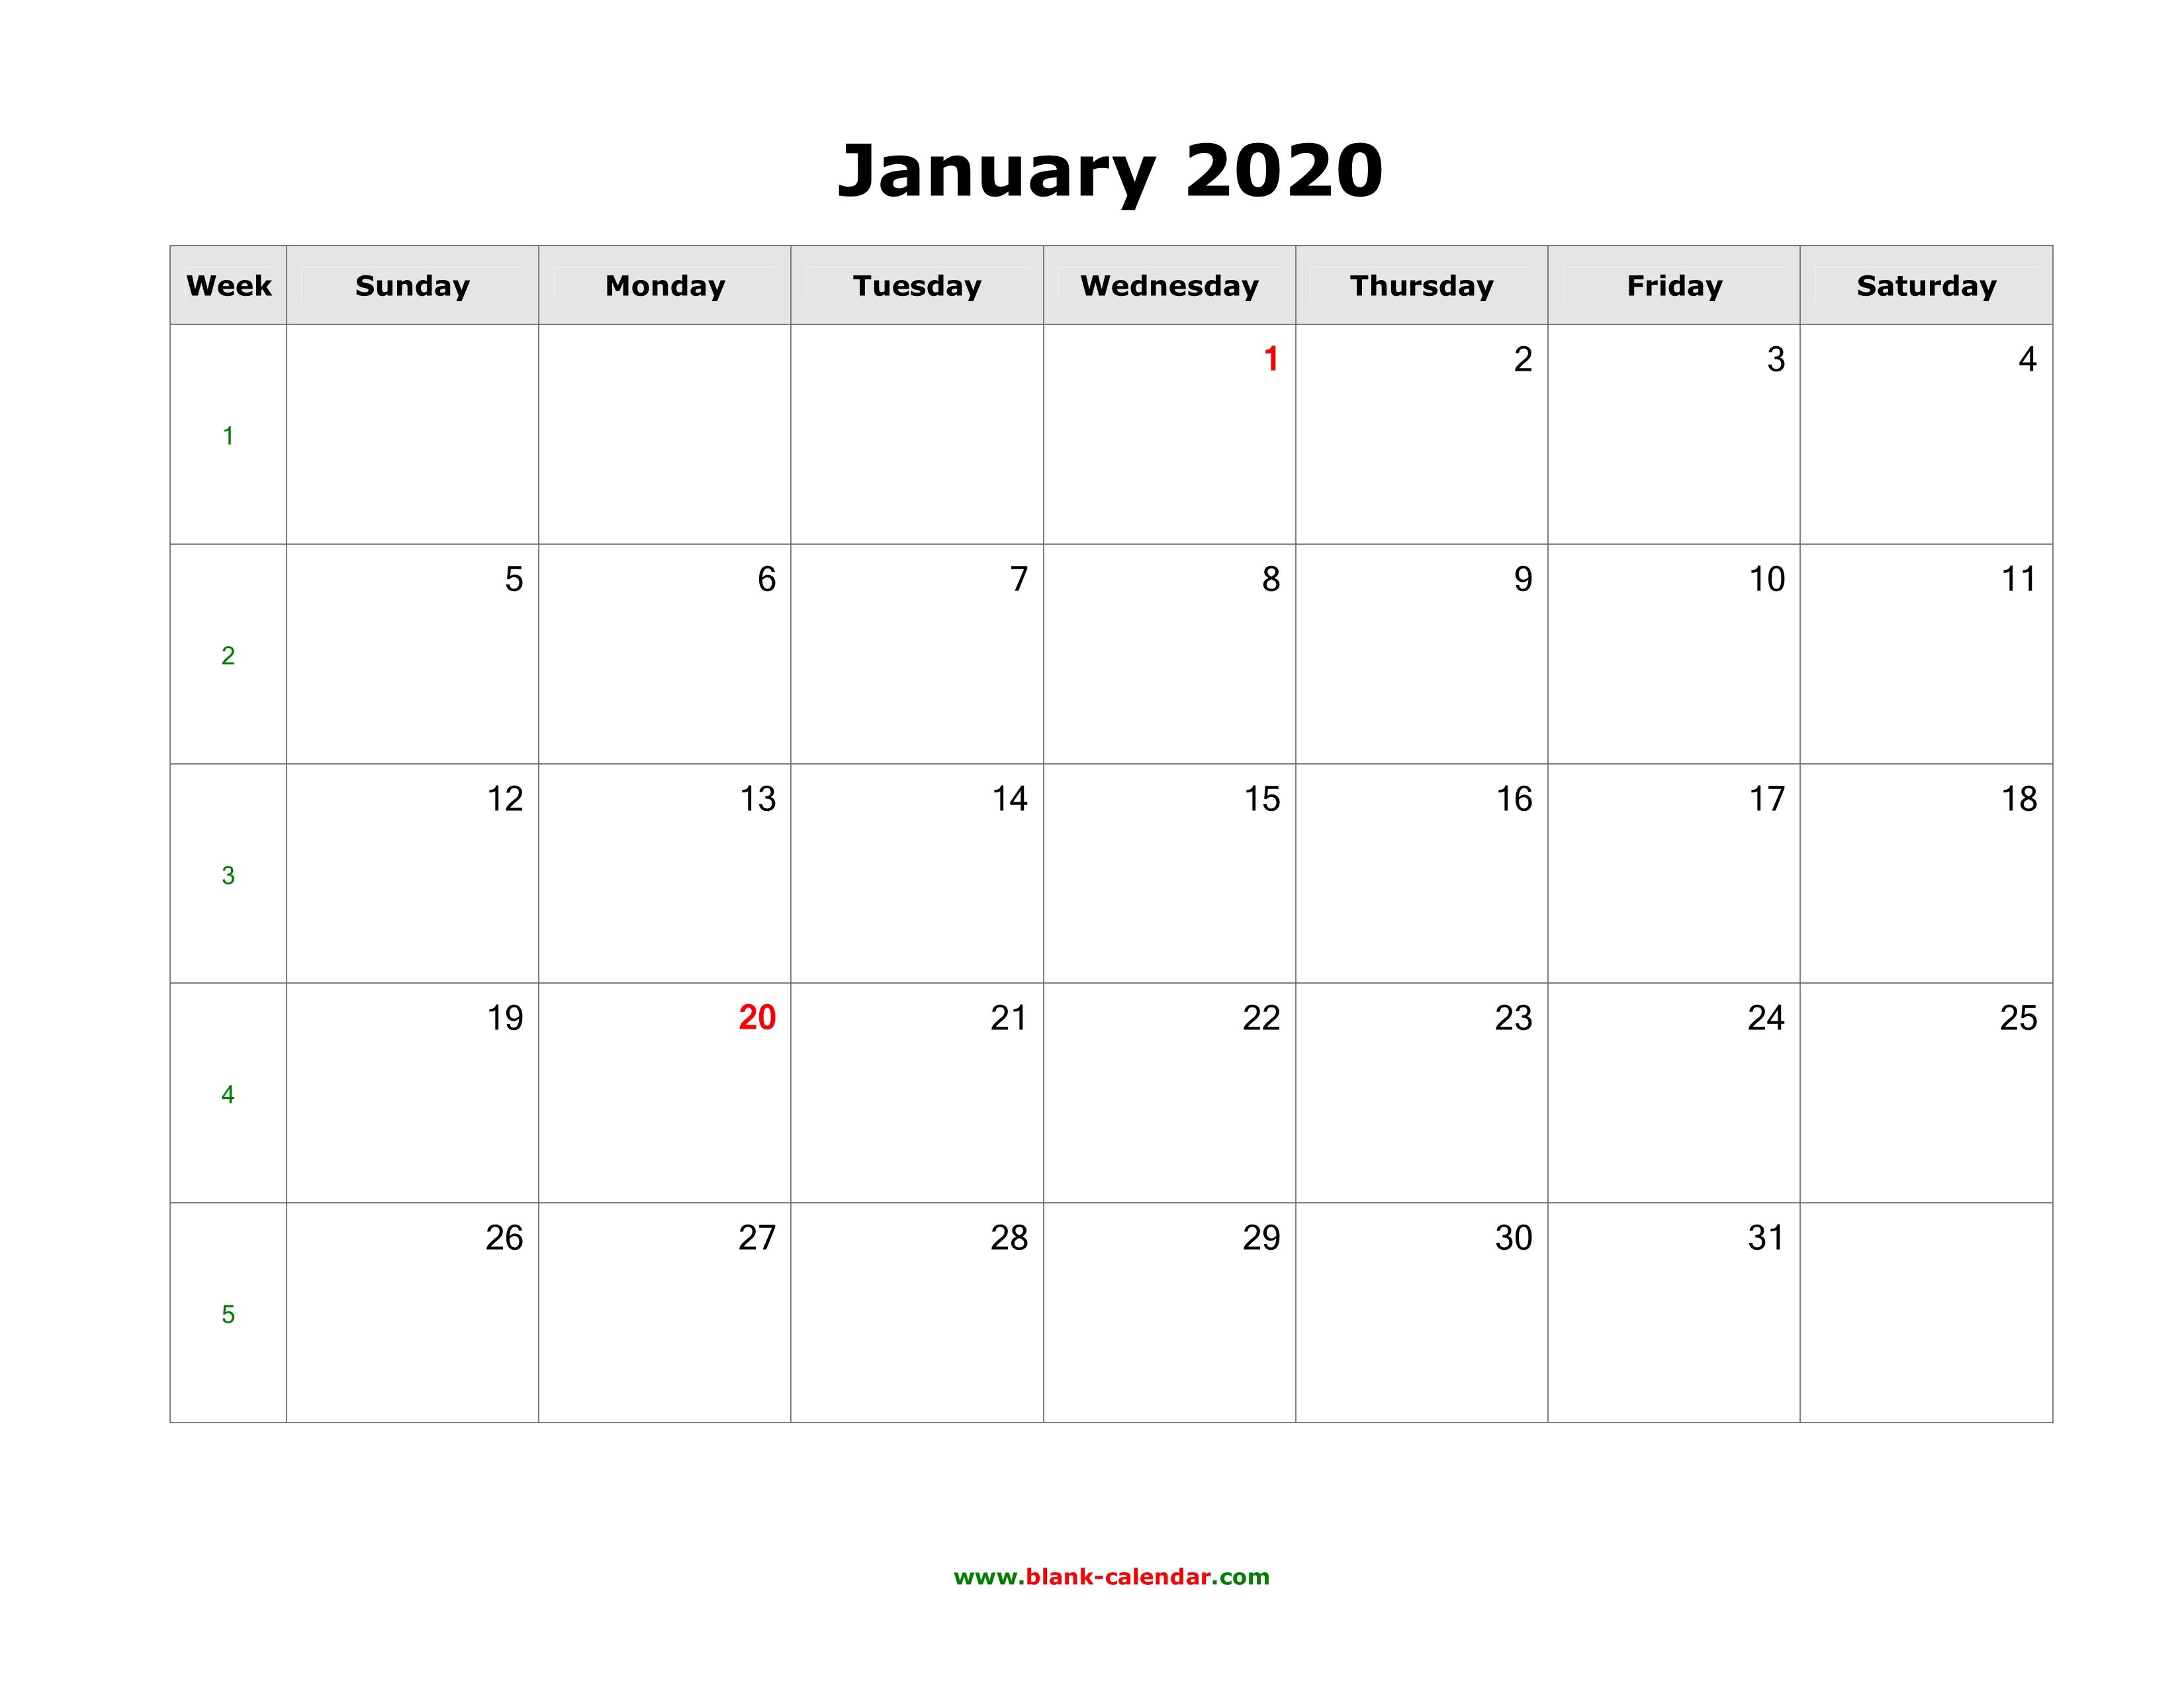 Download January 2020 Blank Calendar (Horizontal)